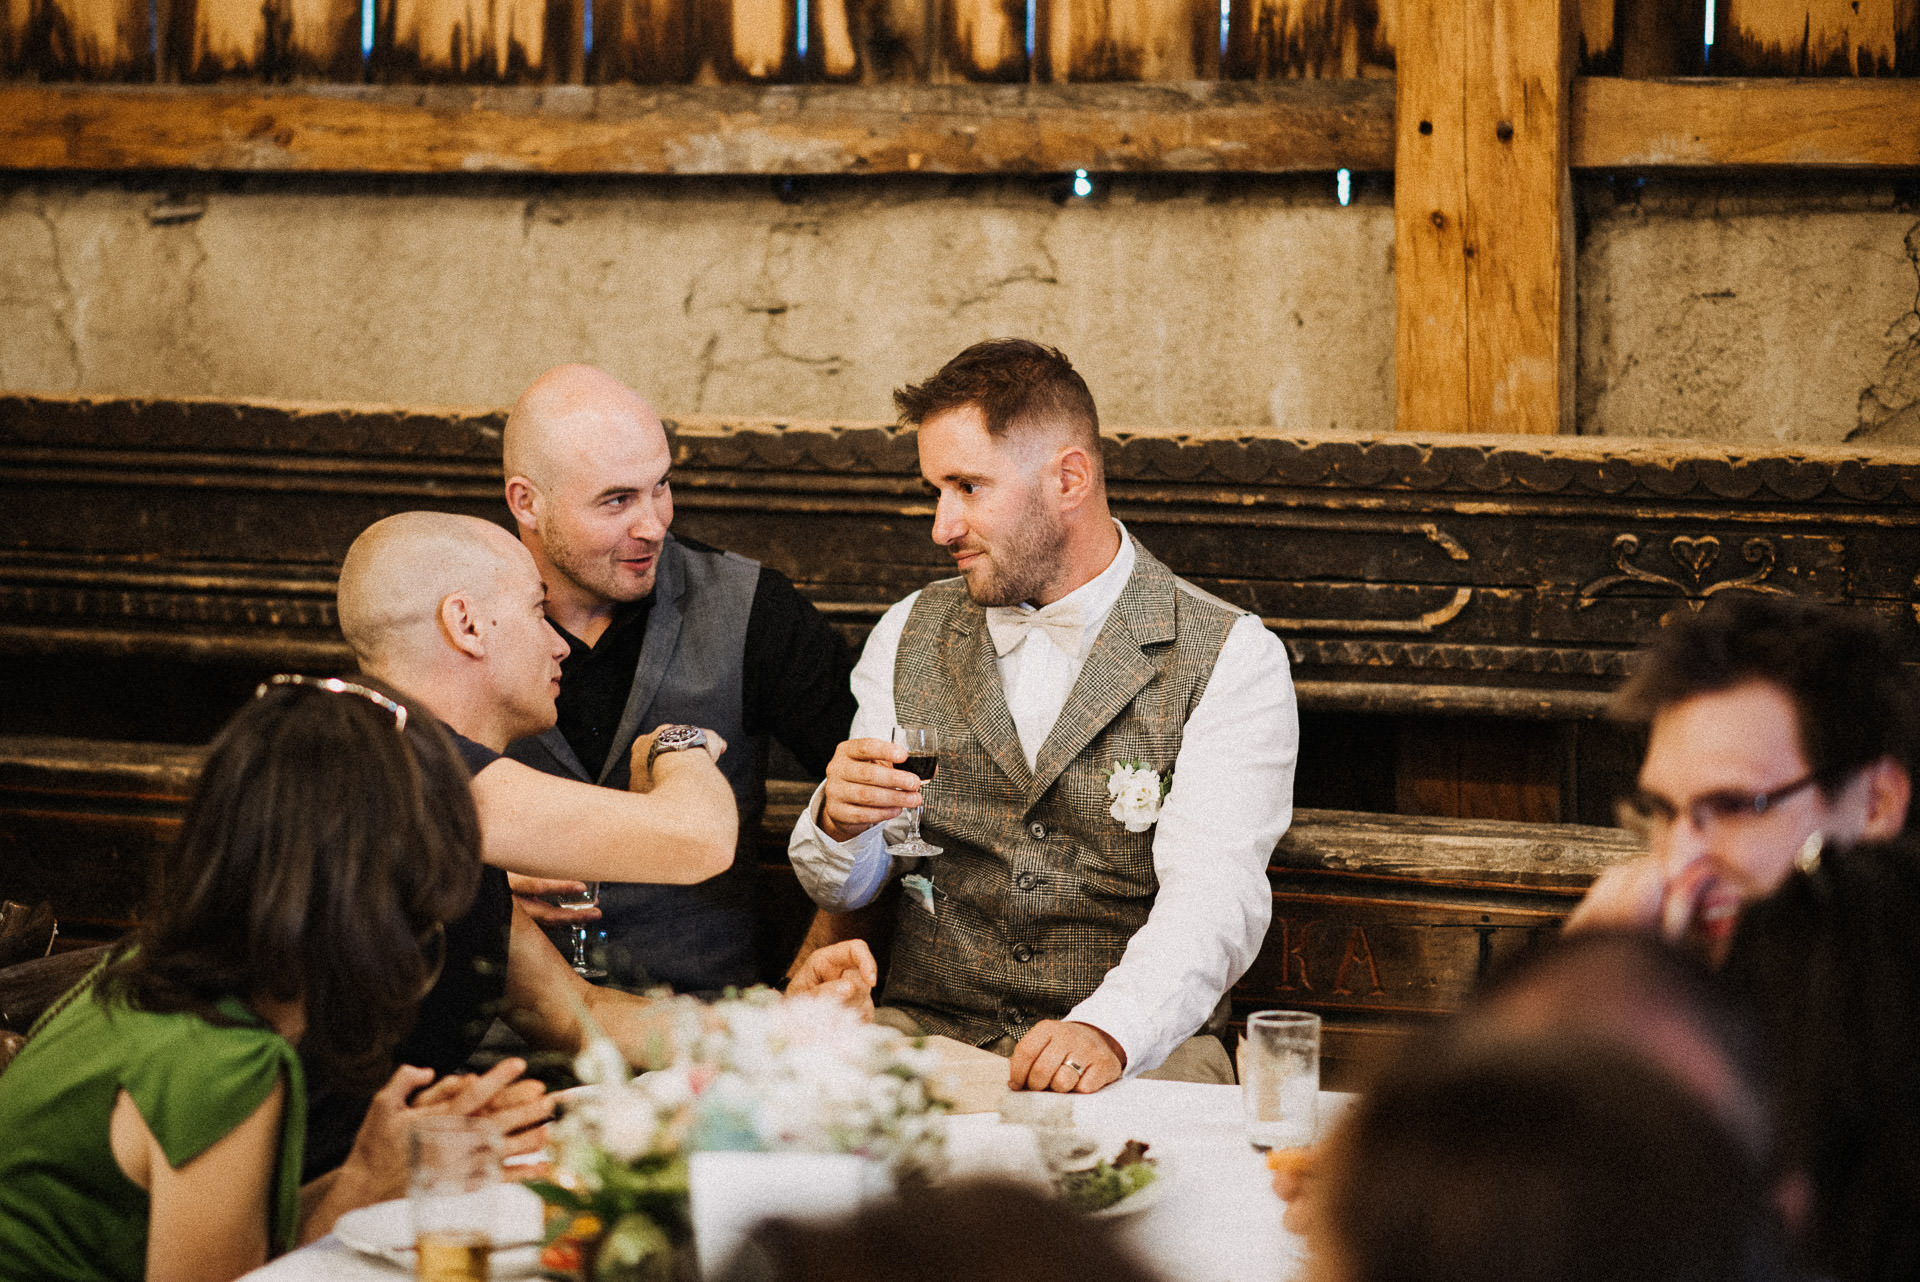 eskuvo pajta wedding barn groom friends baratok volegeny